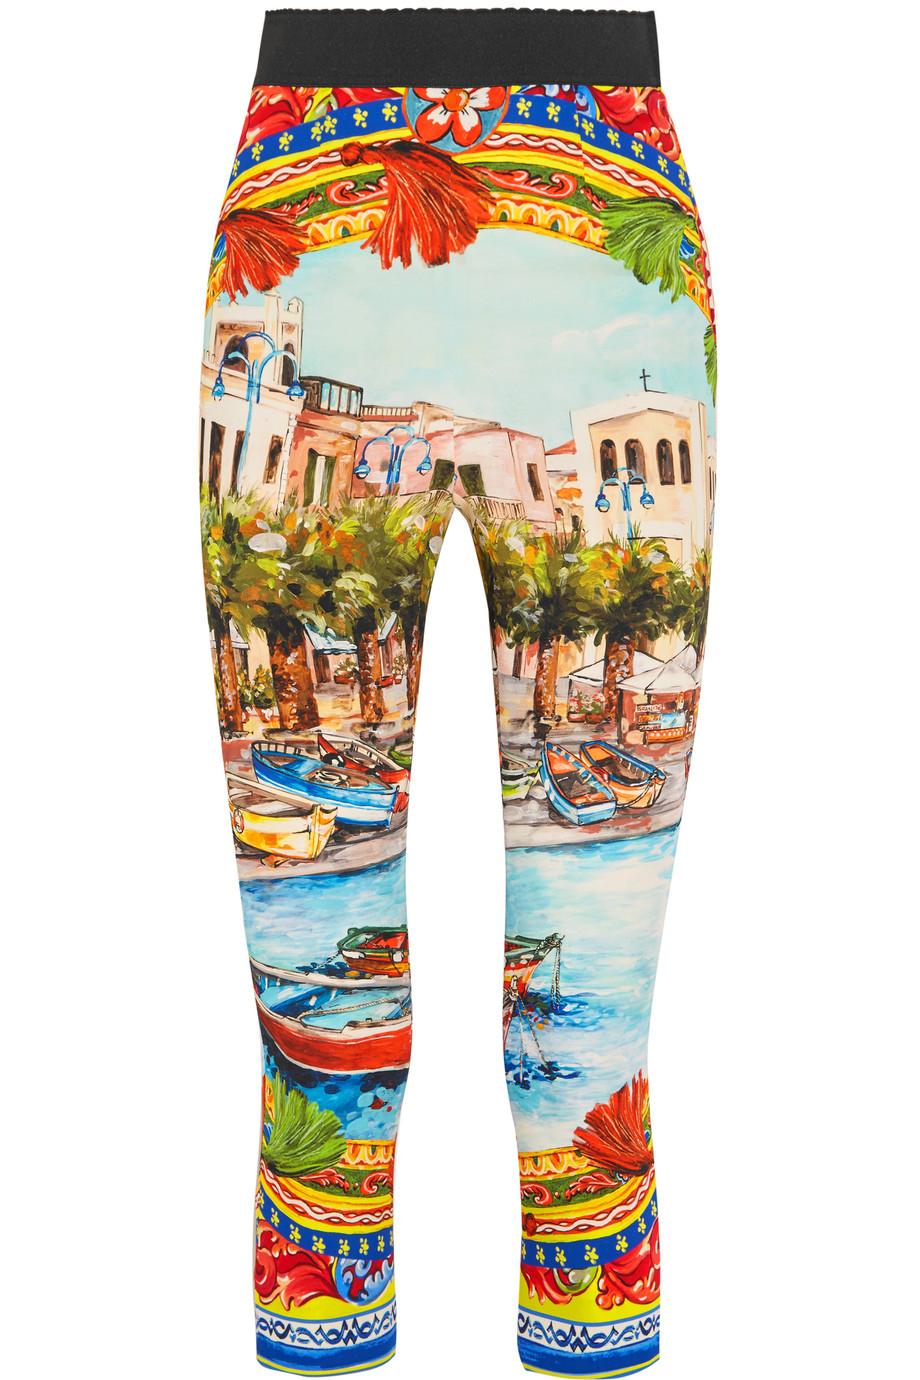 Dolce & Gabbana Cropped Printed Stretch-Silk Skinny Pants, Orange/Sky Blue, Women's, Size: 38